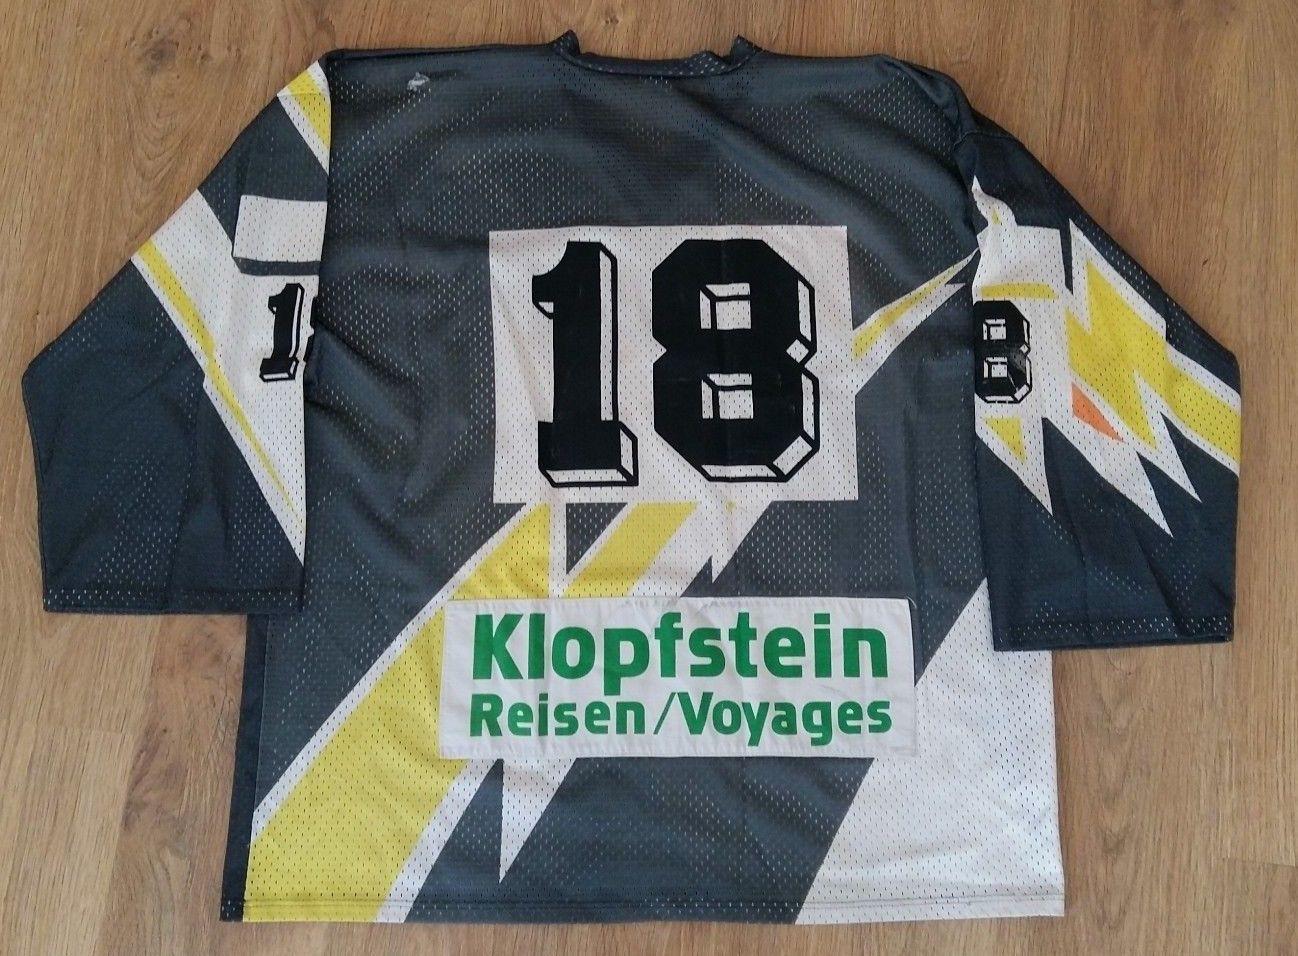 maillots.ch - Gottéron Jerseys 1980 - 2019 - Page 3 1990_91b